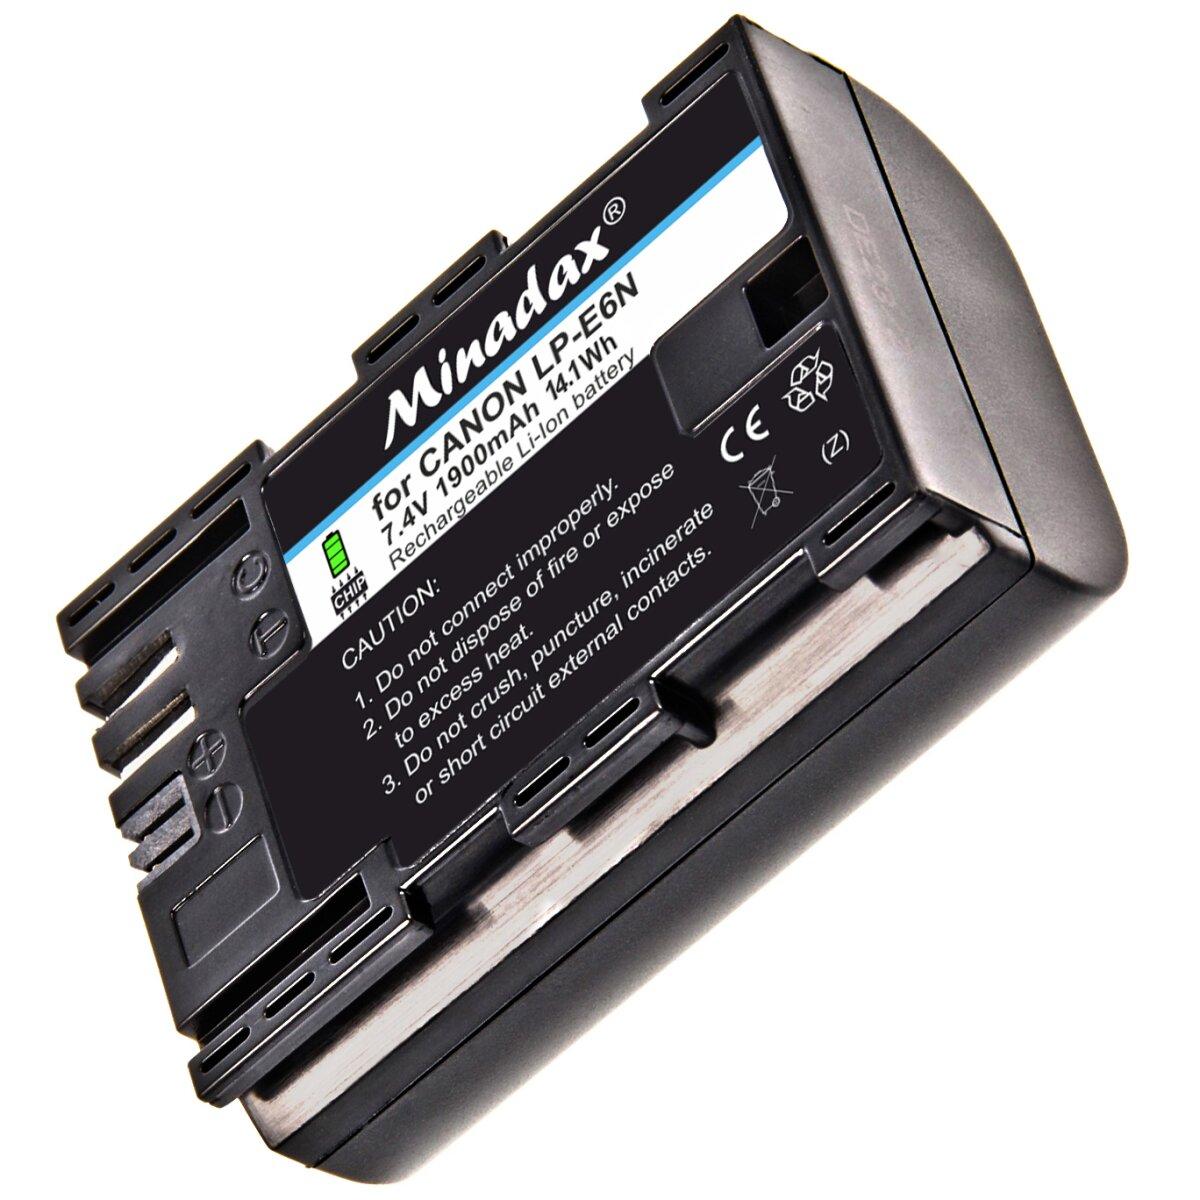 Minadax Qualitätsakku LP-E6 LP-E6N mit echten 1900 mAh kompatibel mitCanonEOS 90D 5DS 5DSR 5D Mark II/III/IV 60D/Da 70D 80D 6D 7D 7D MarkII 6D MarkII, EOS R, XC10